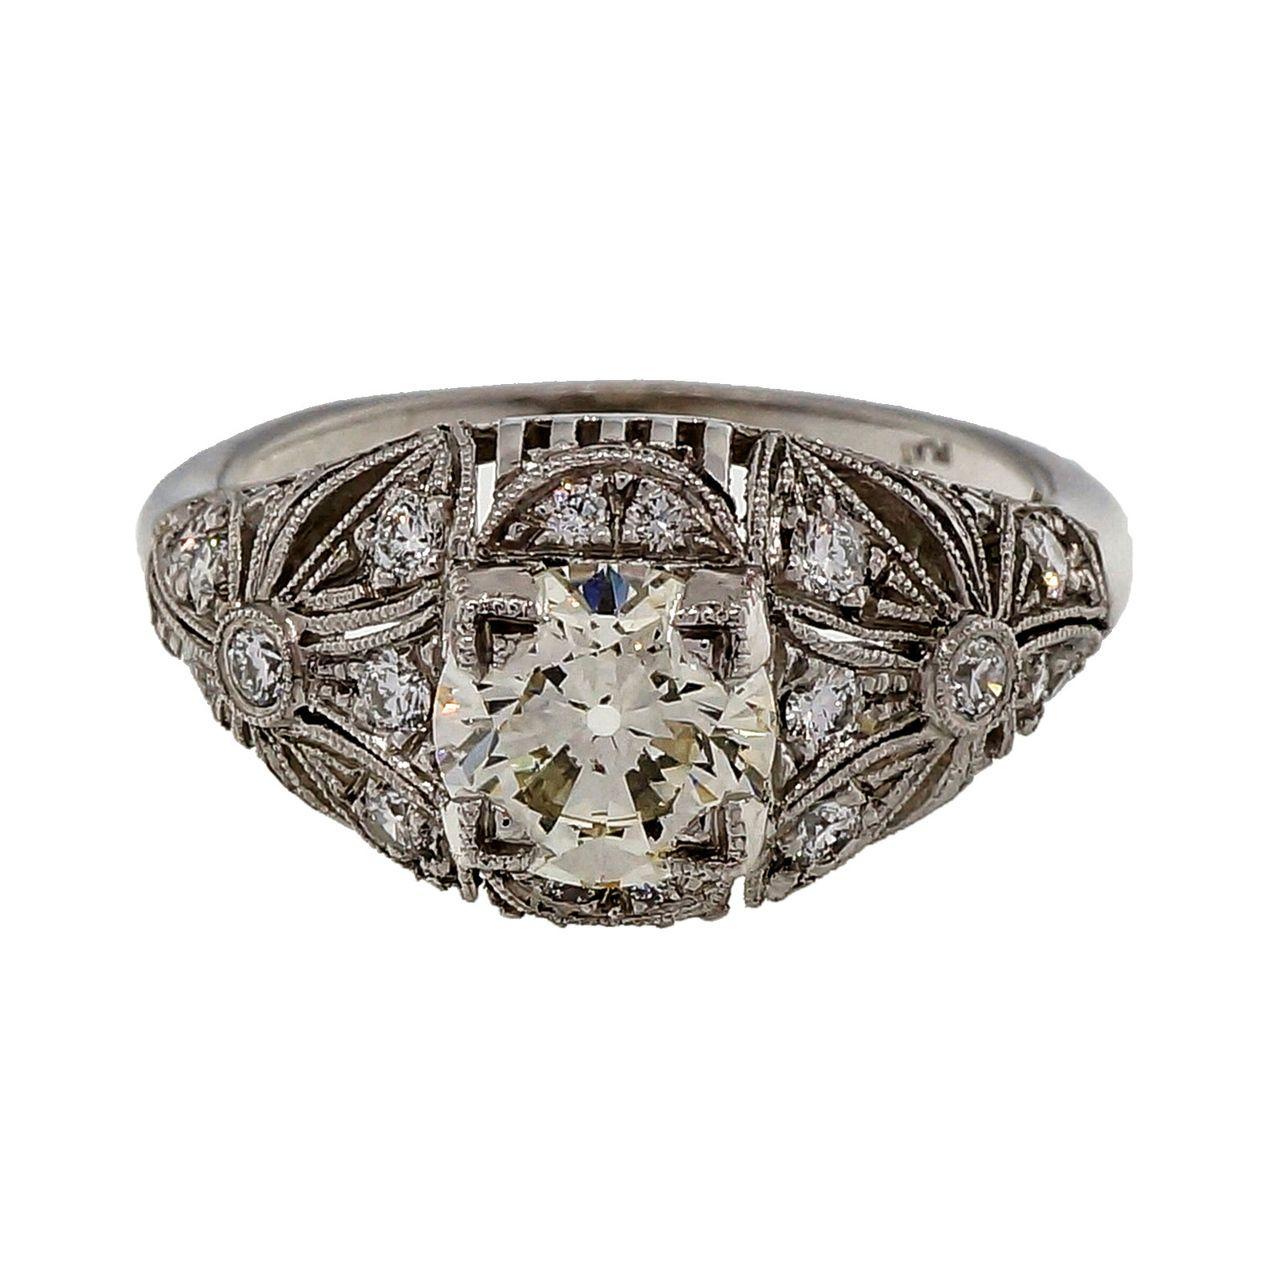 Antique Edwardian Art Deco 1.03ct Transitional Cut Platinum Diamond Ring - petersuchyjewelers